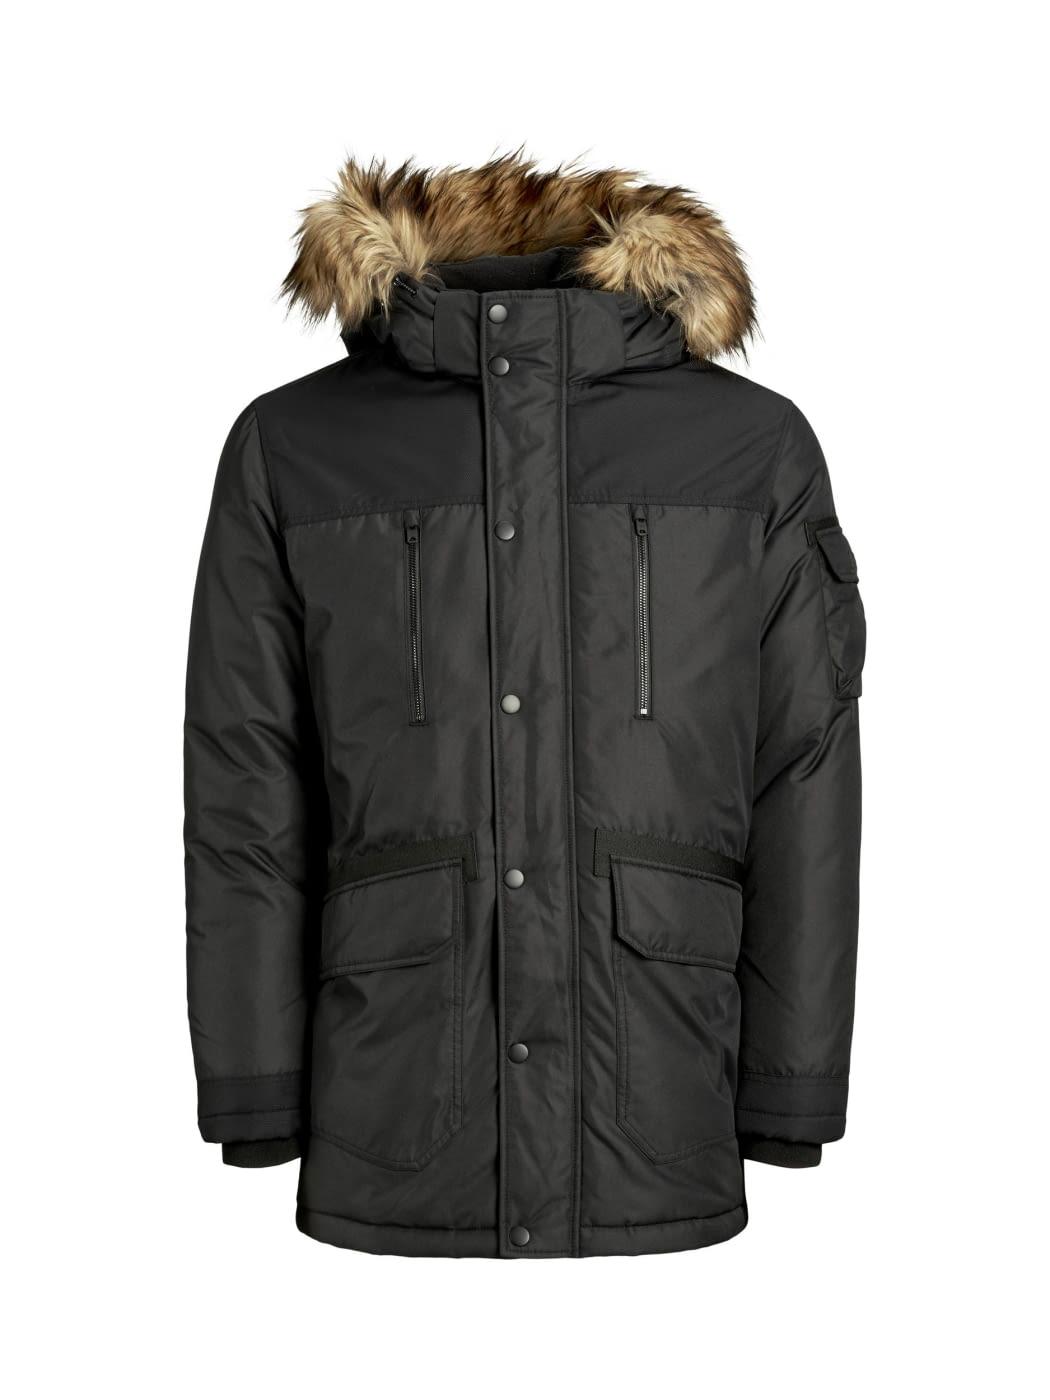 JACK & JONES chaqueta JJEGLOBE PARKA